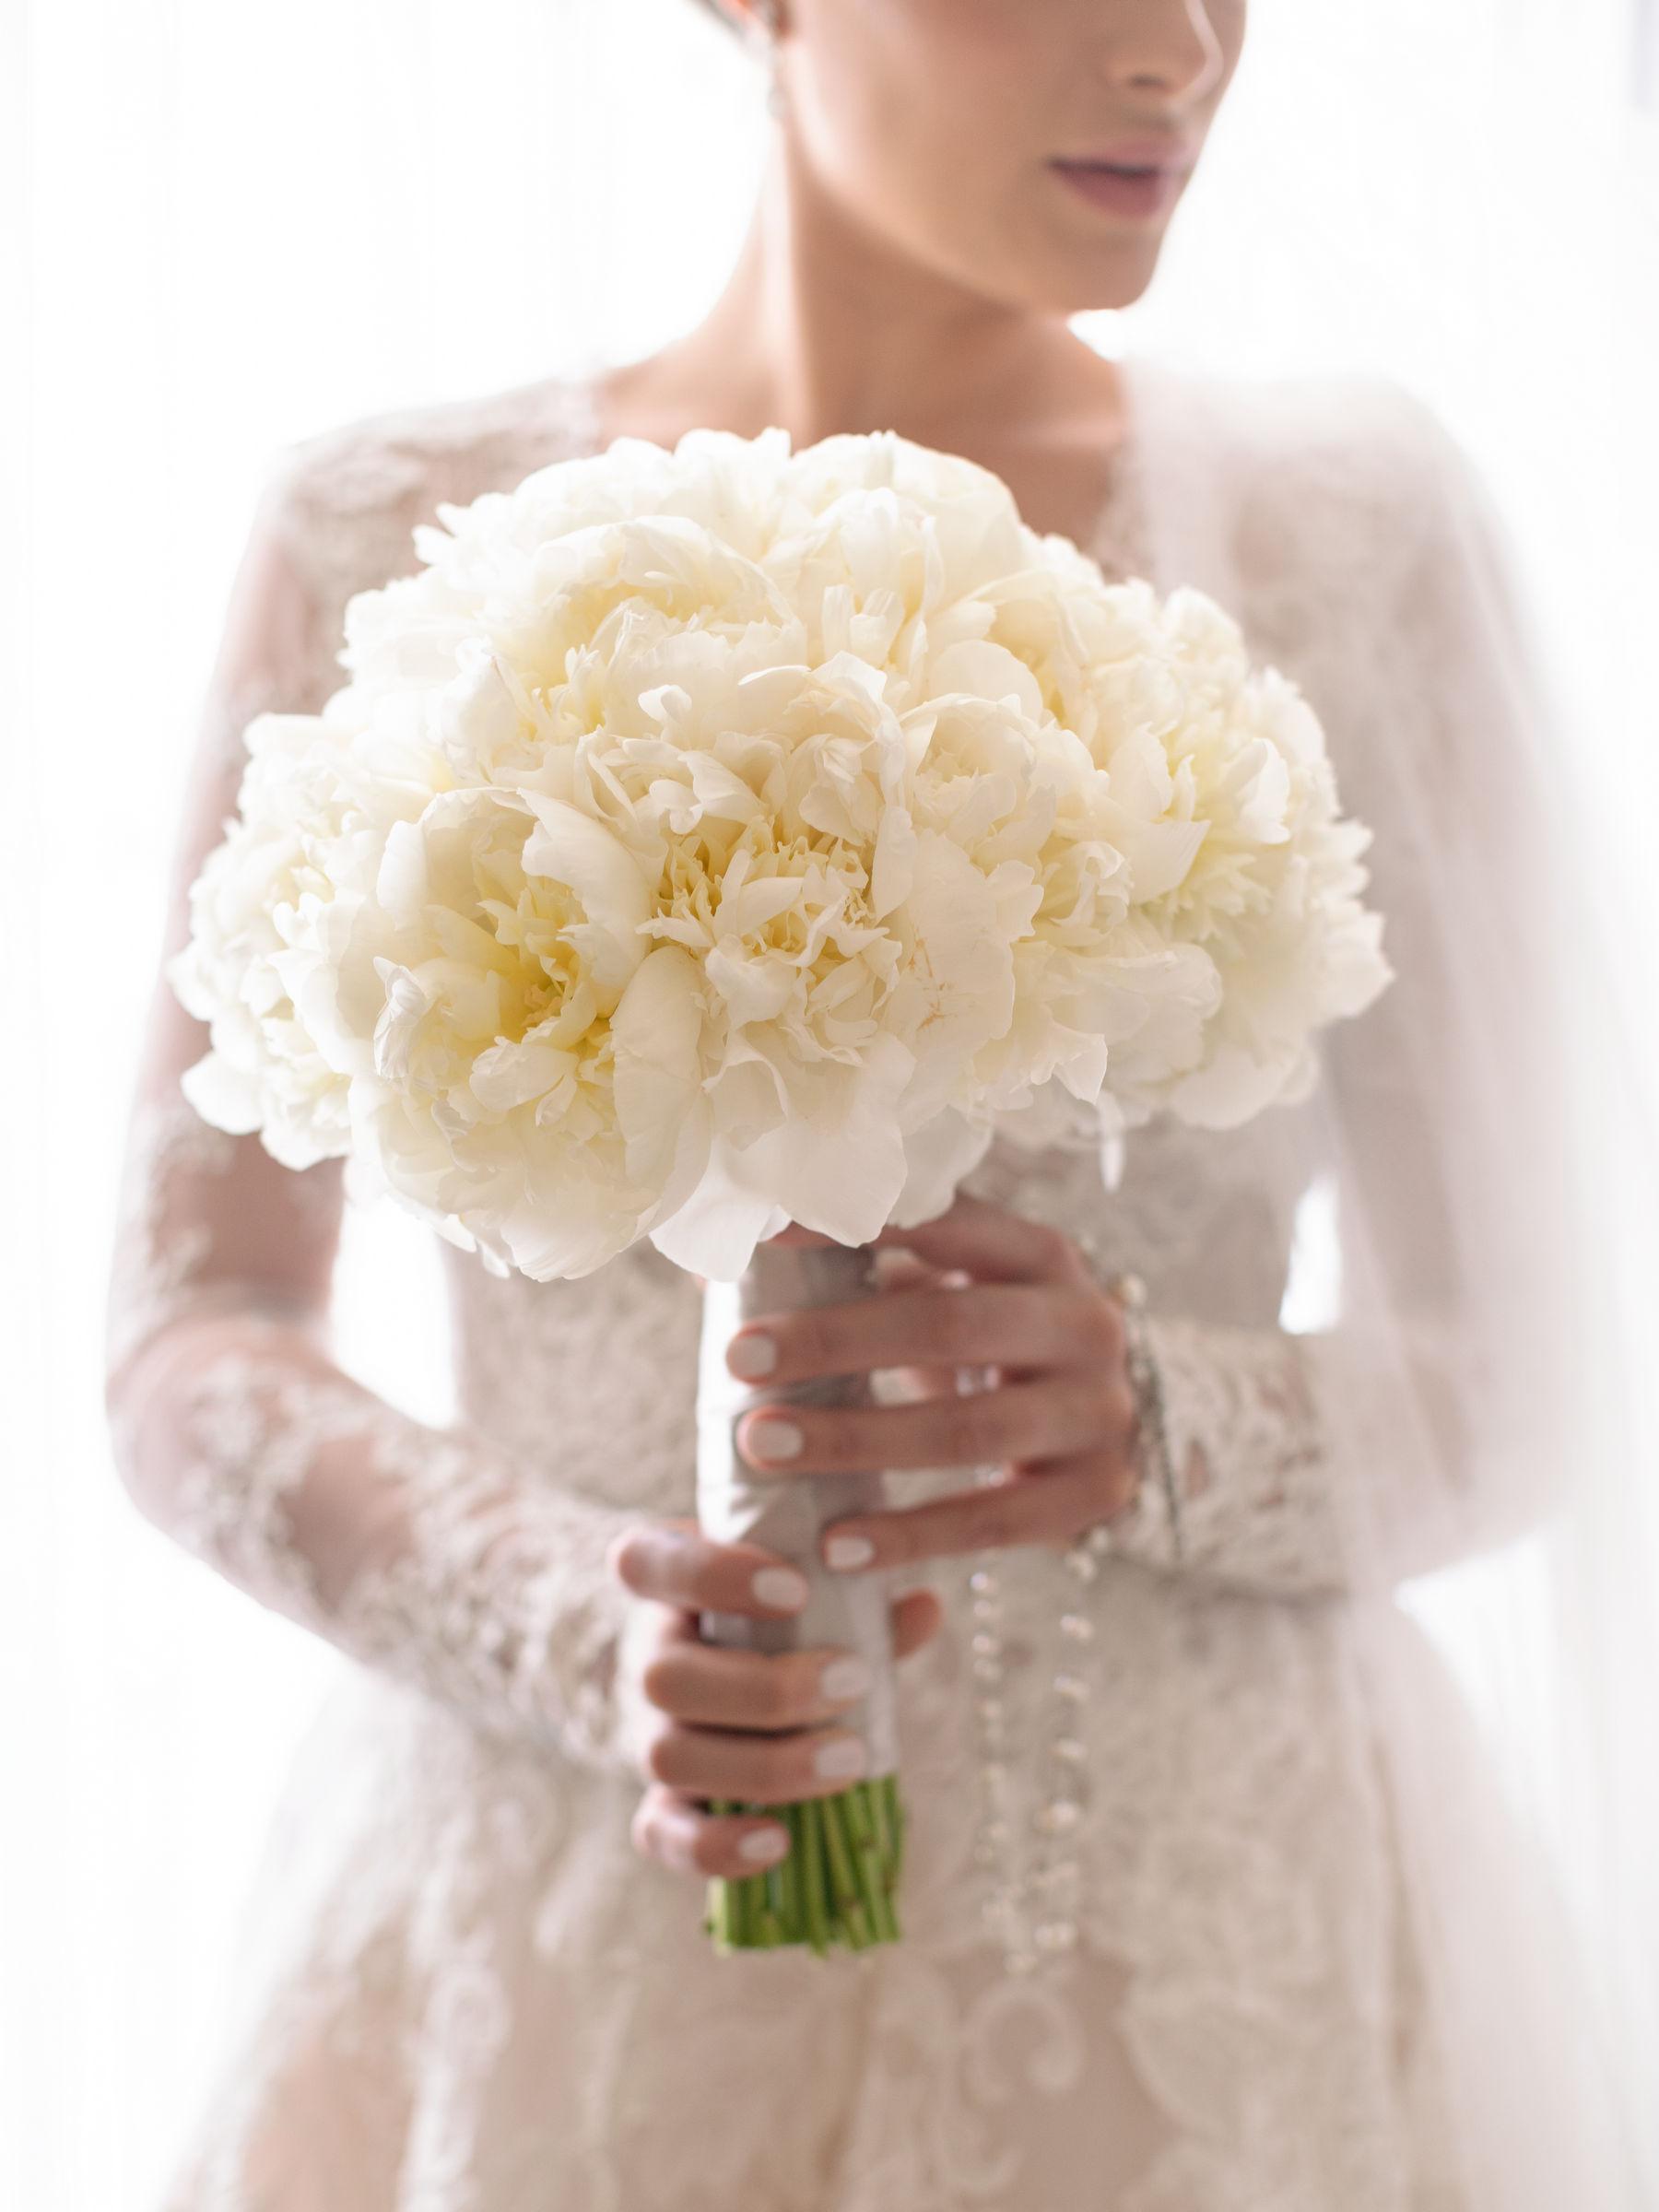 maria-eduardo-montage-beverly-hills-wedding-135.jpg